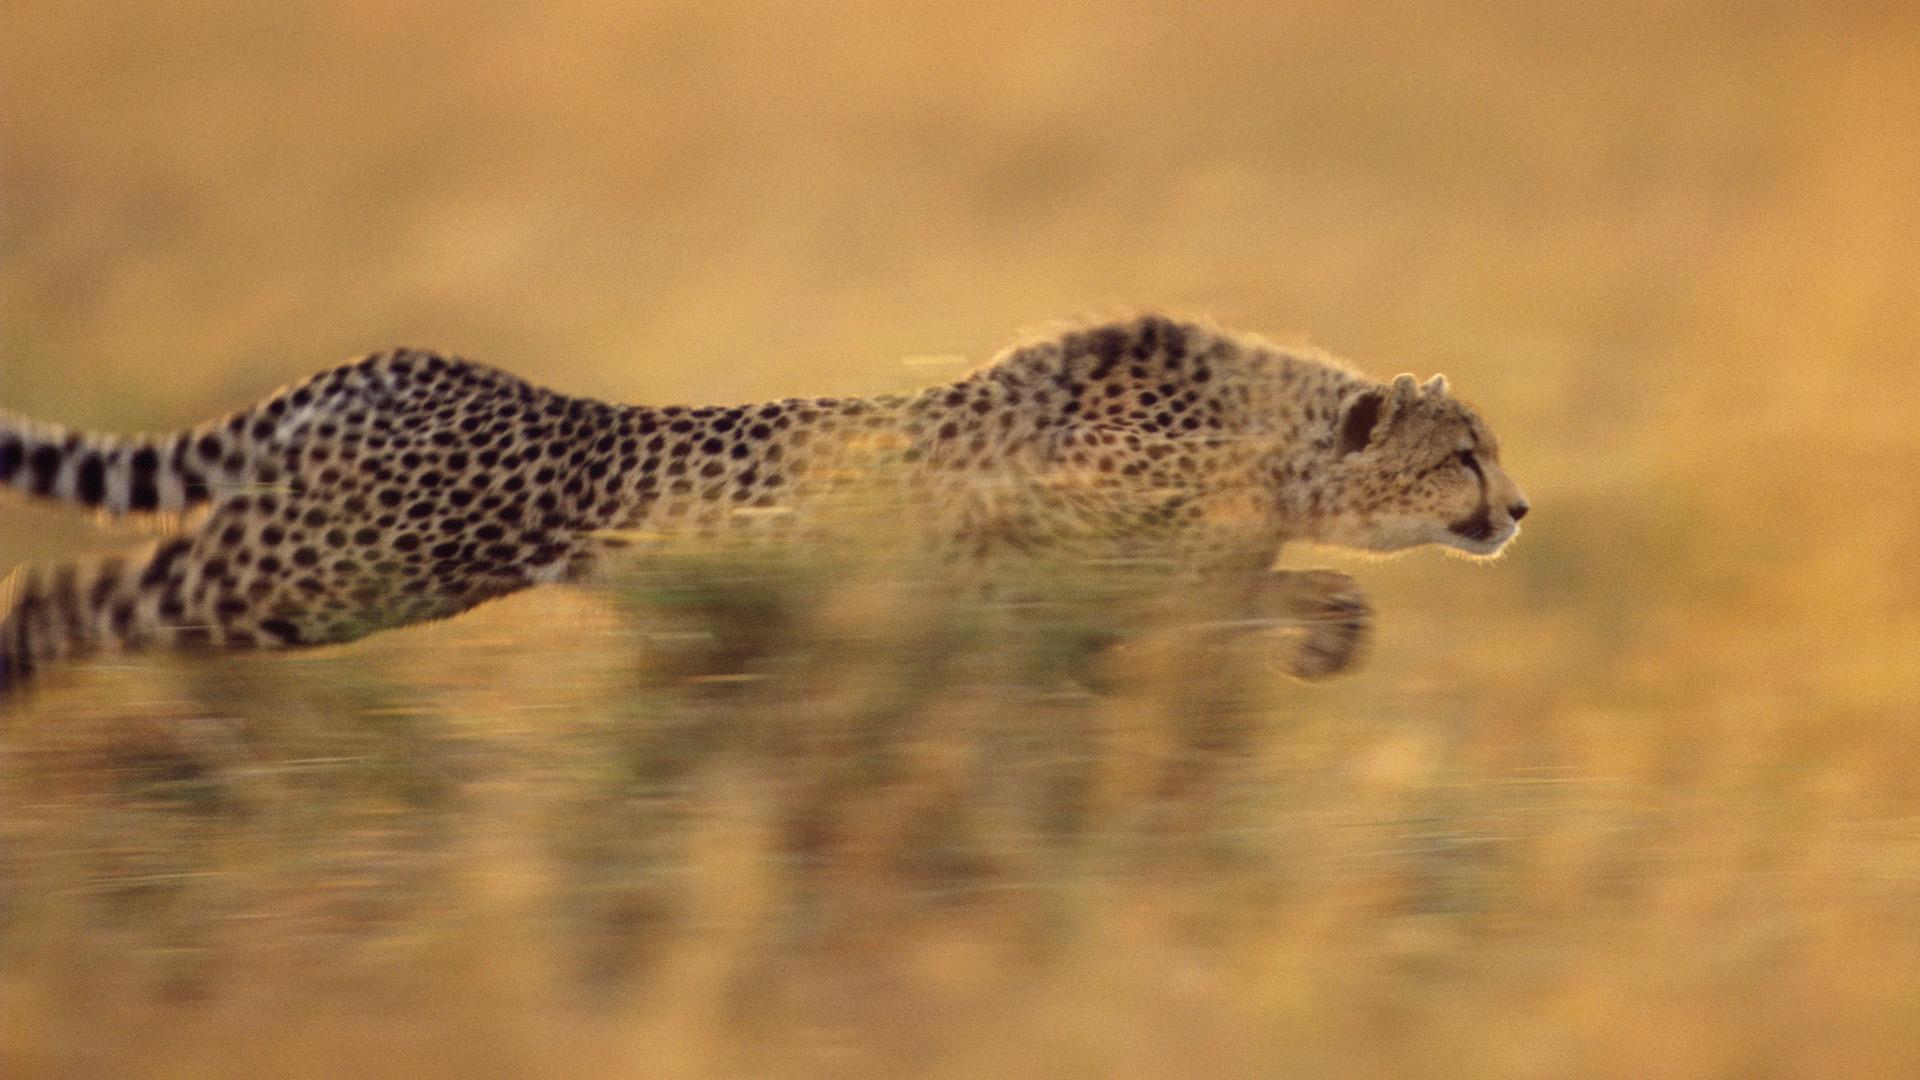 Картинки гепарда в бегу